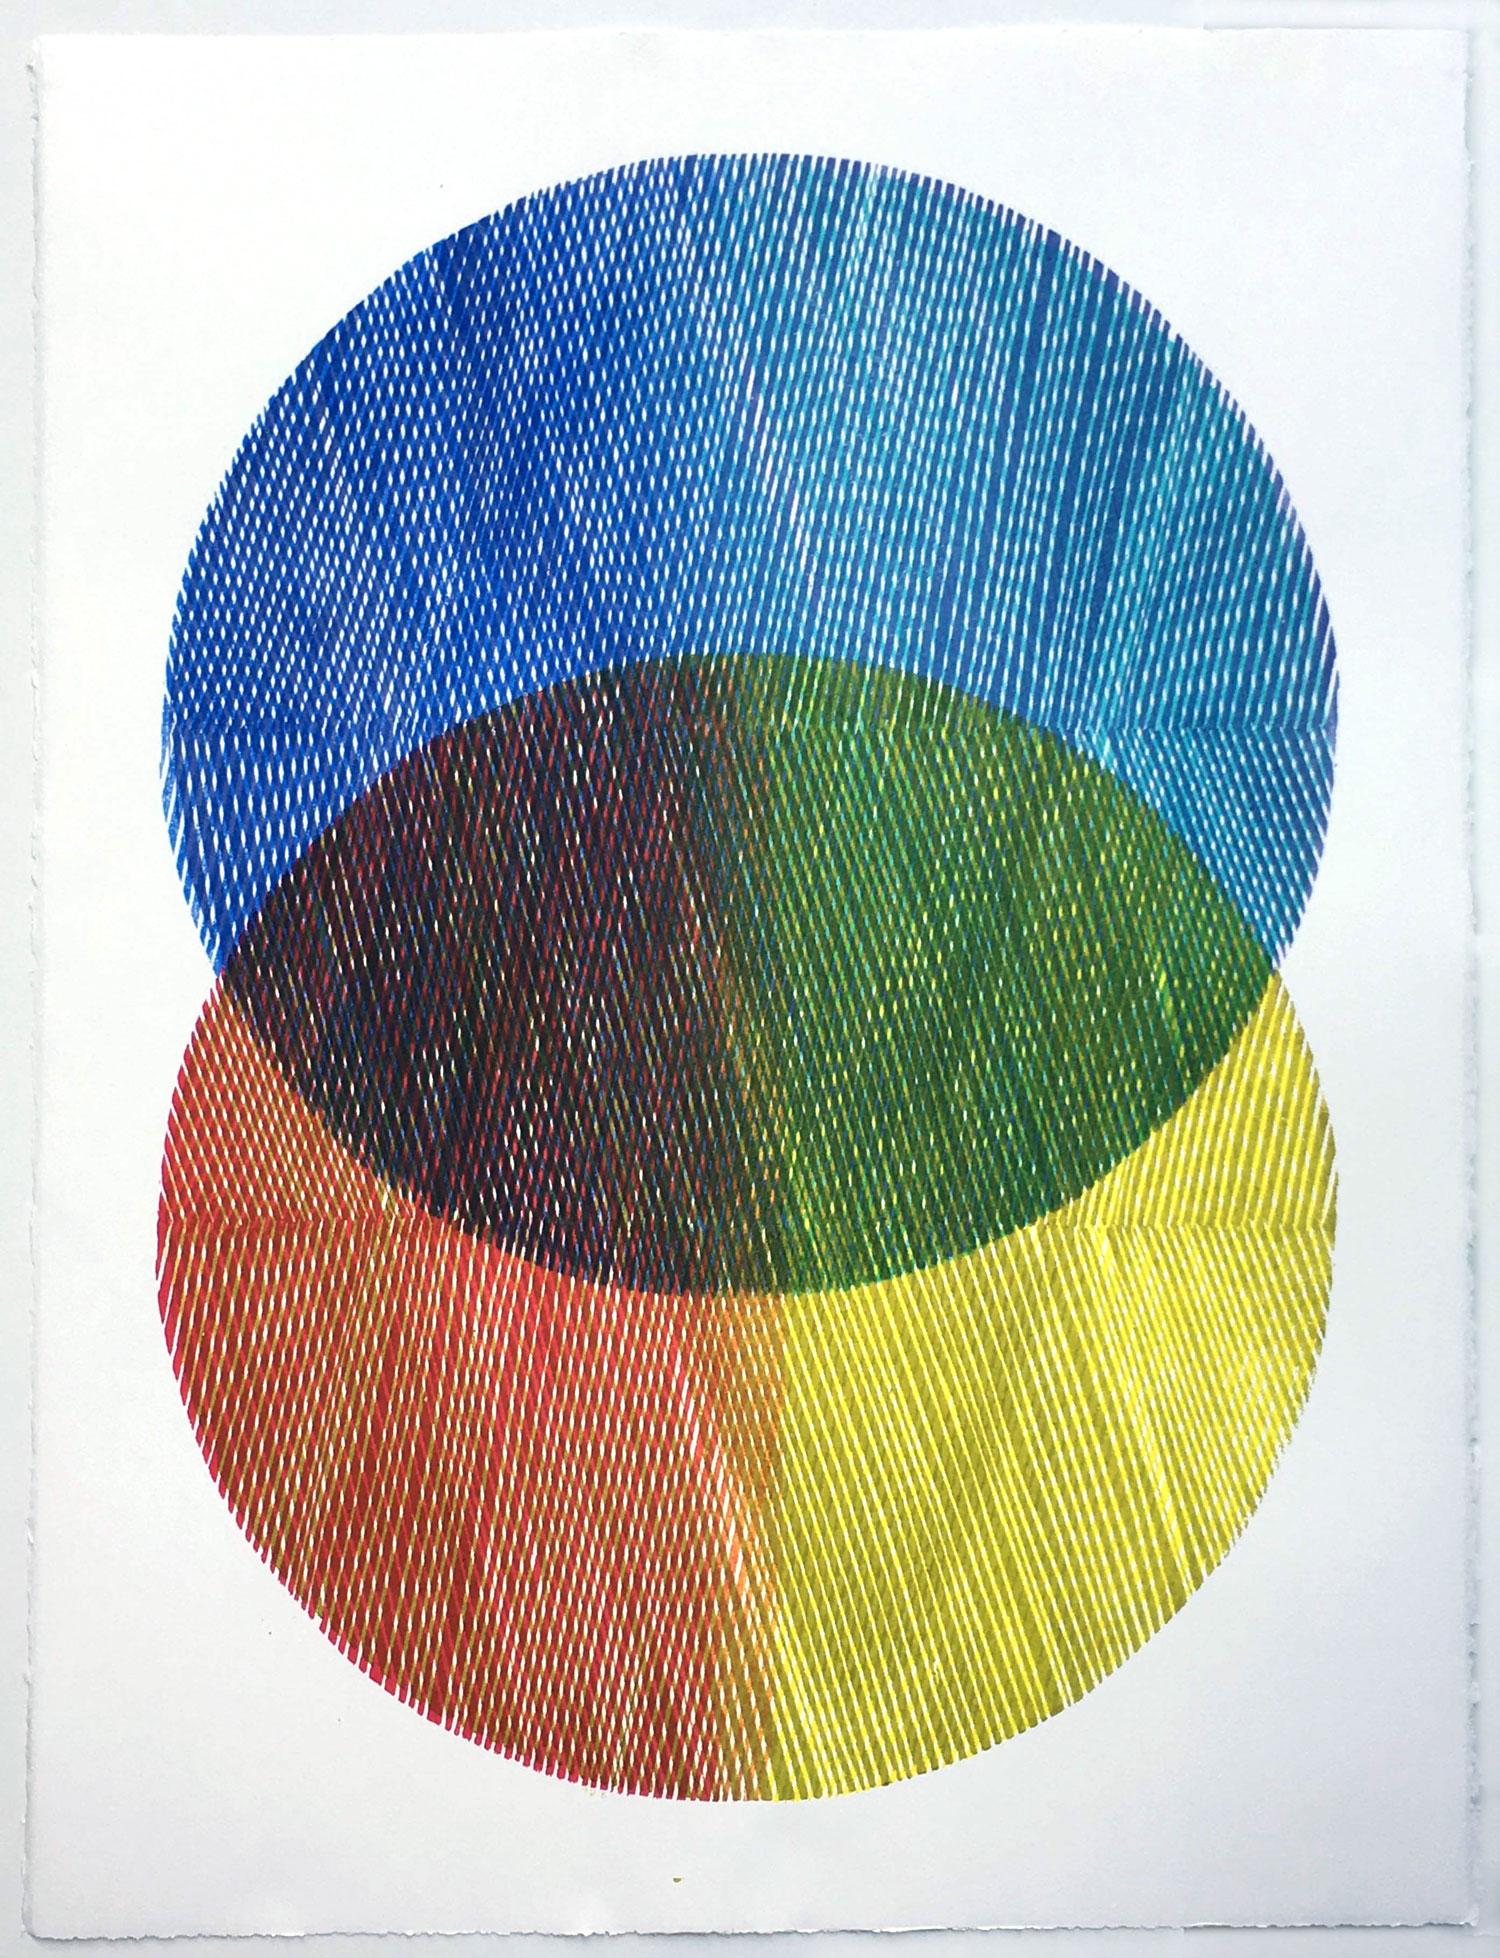 Lucinda-Tanner-Mandorla-Study-III